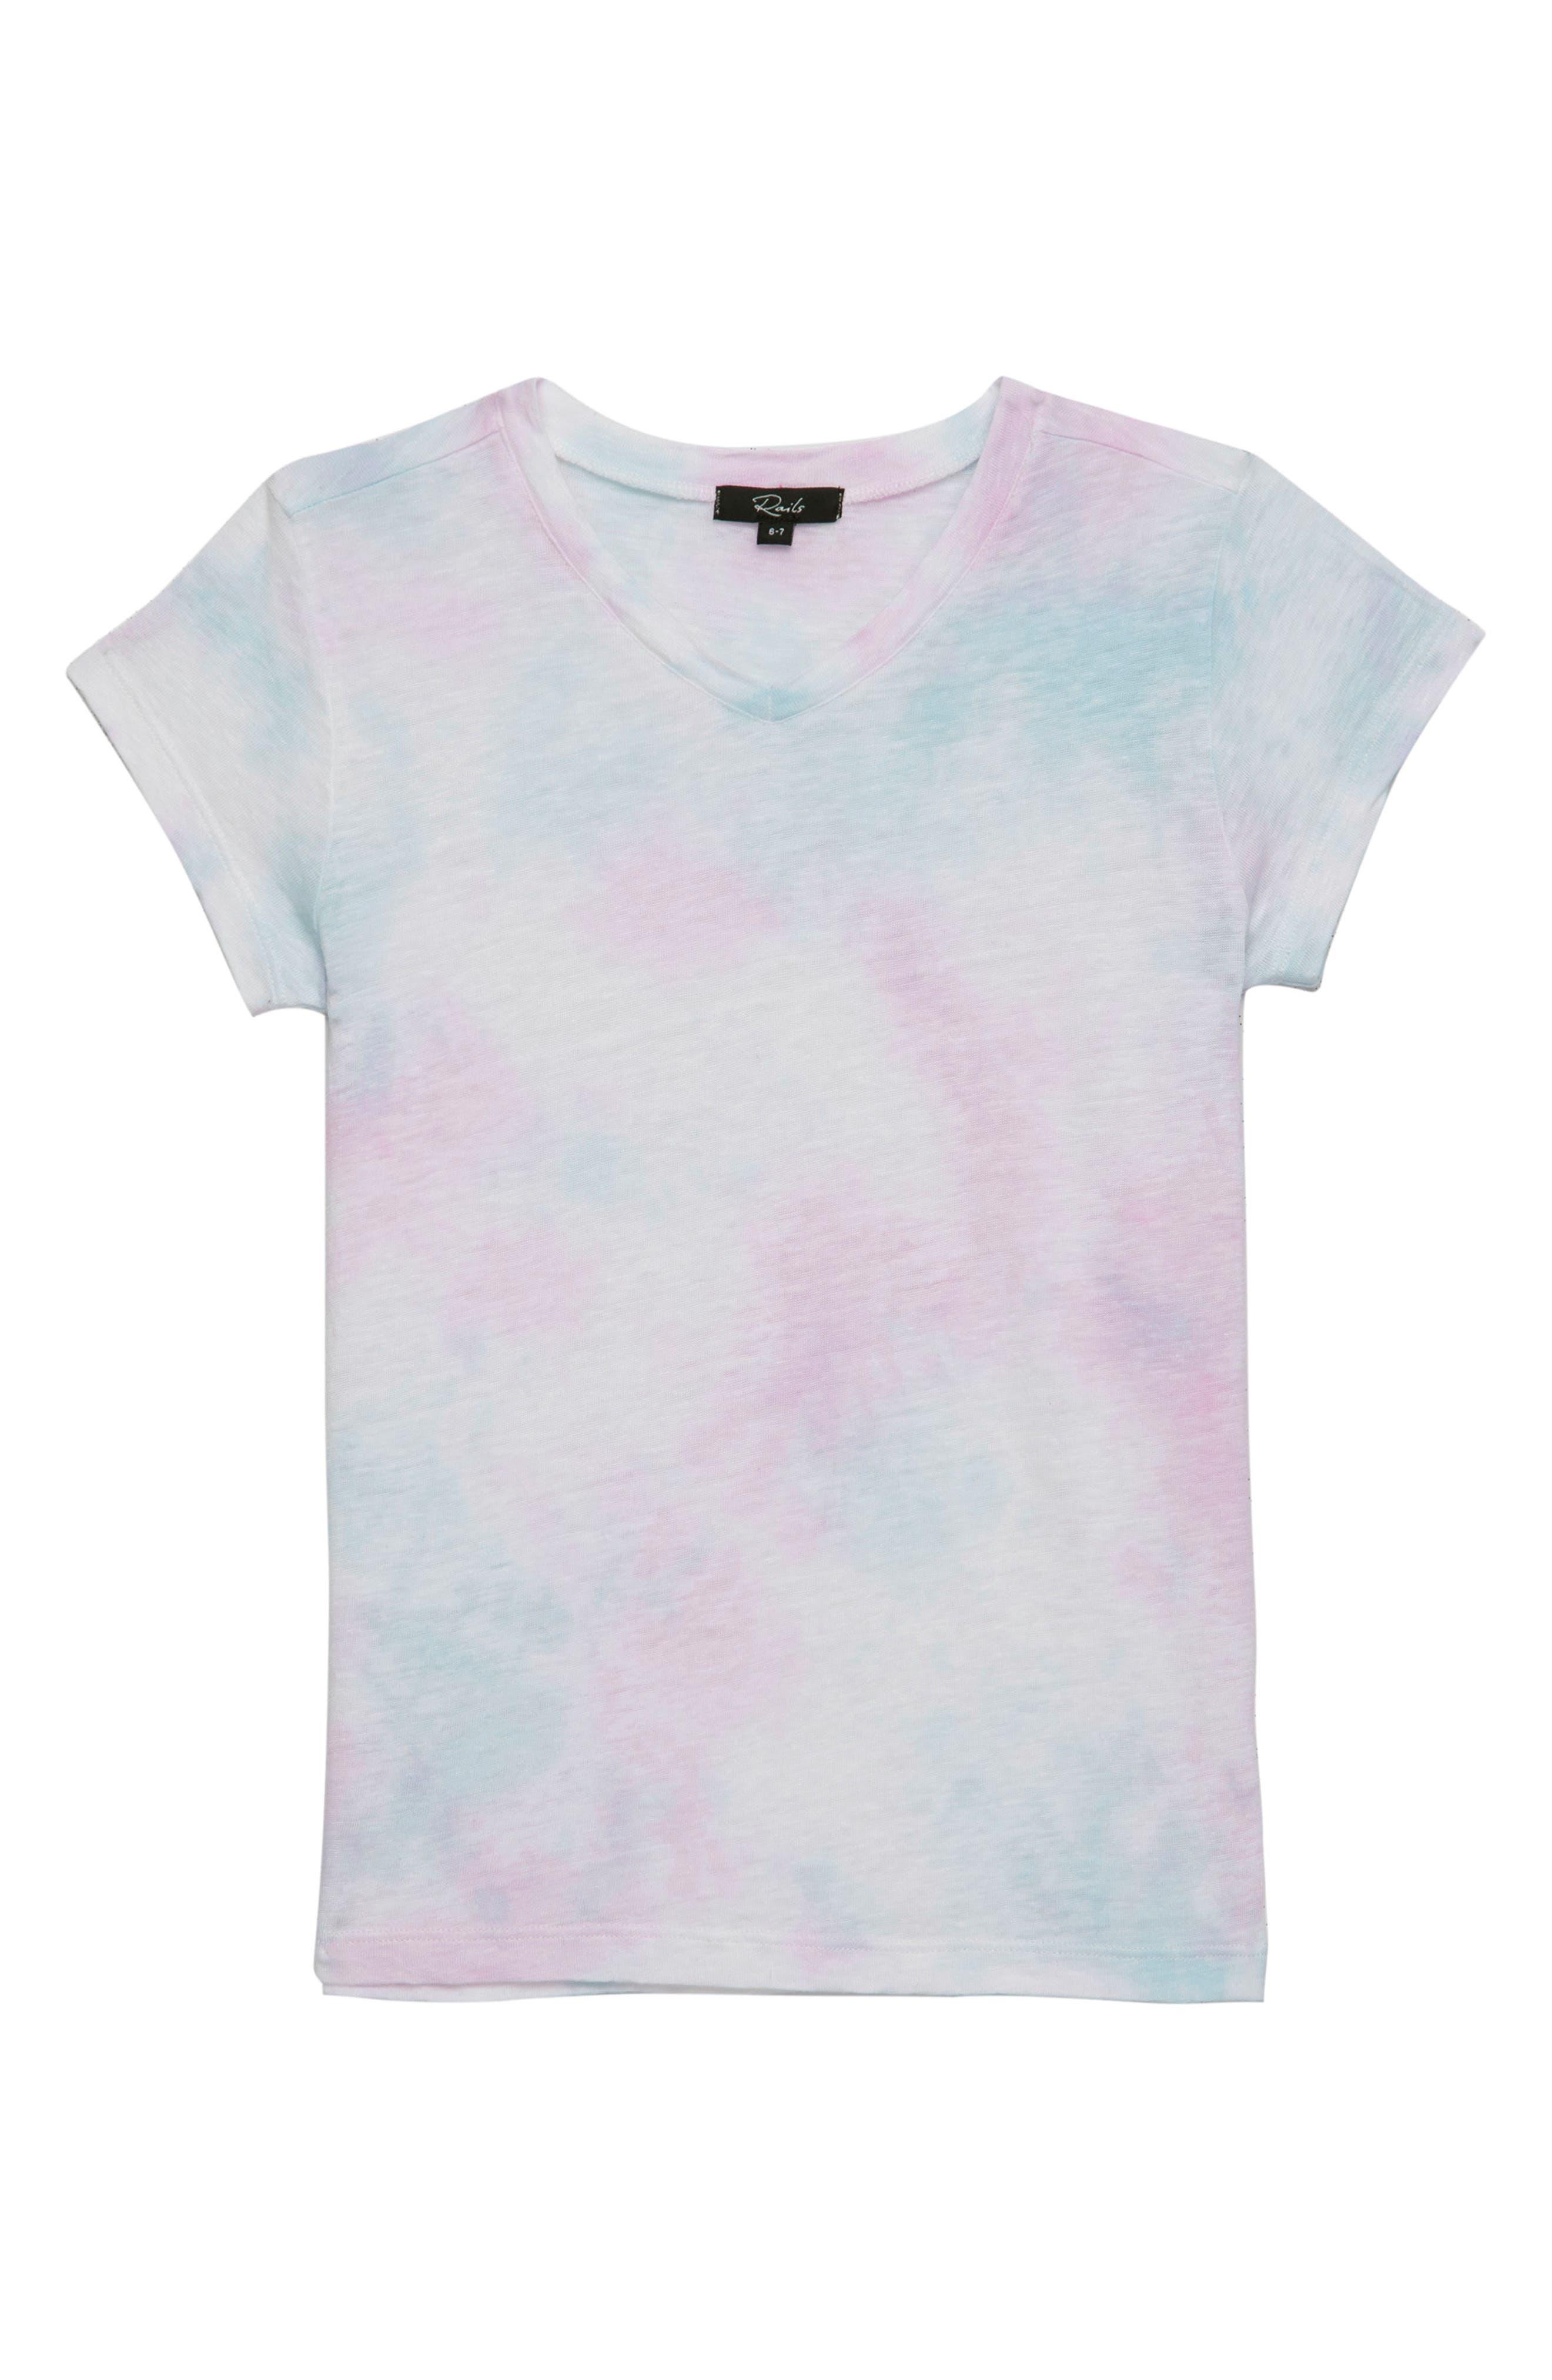 Carlyn Tee,                             Main thumbnail 1, color,                             Rainbow Tie Dye